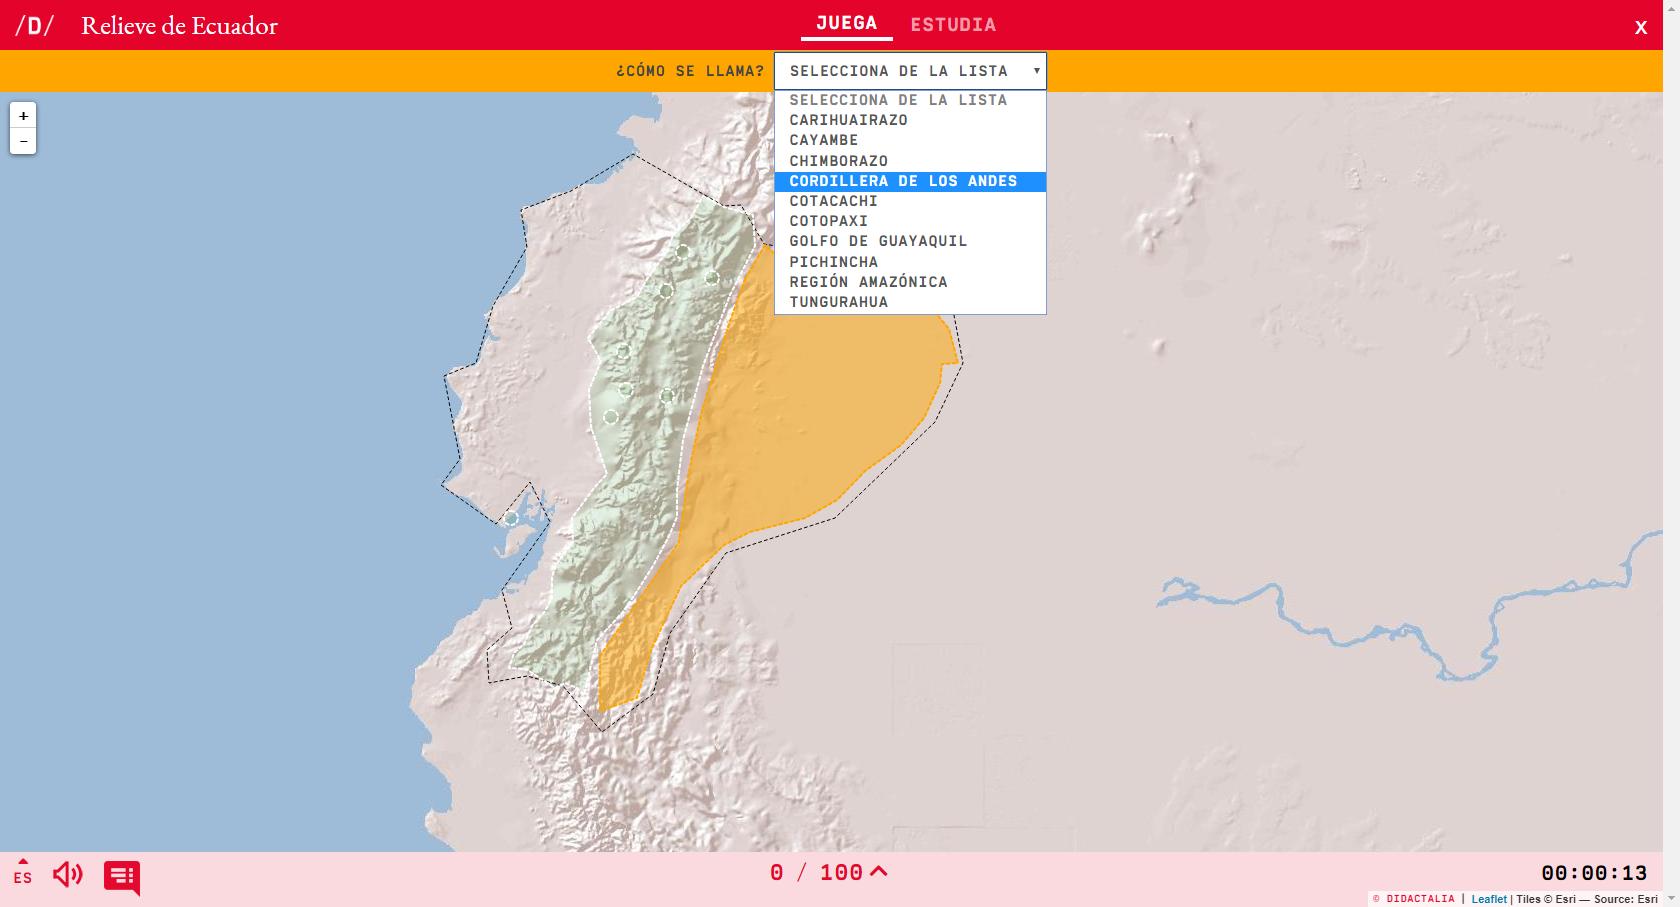 Relief of  Ecuador